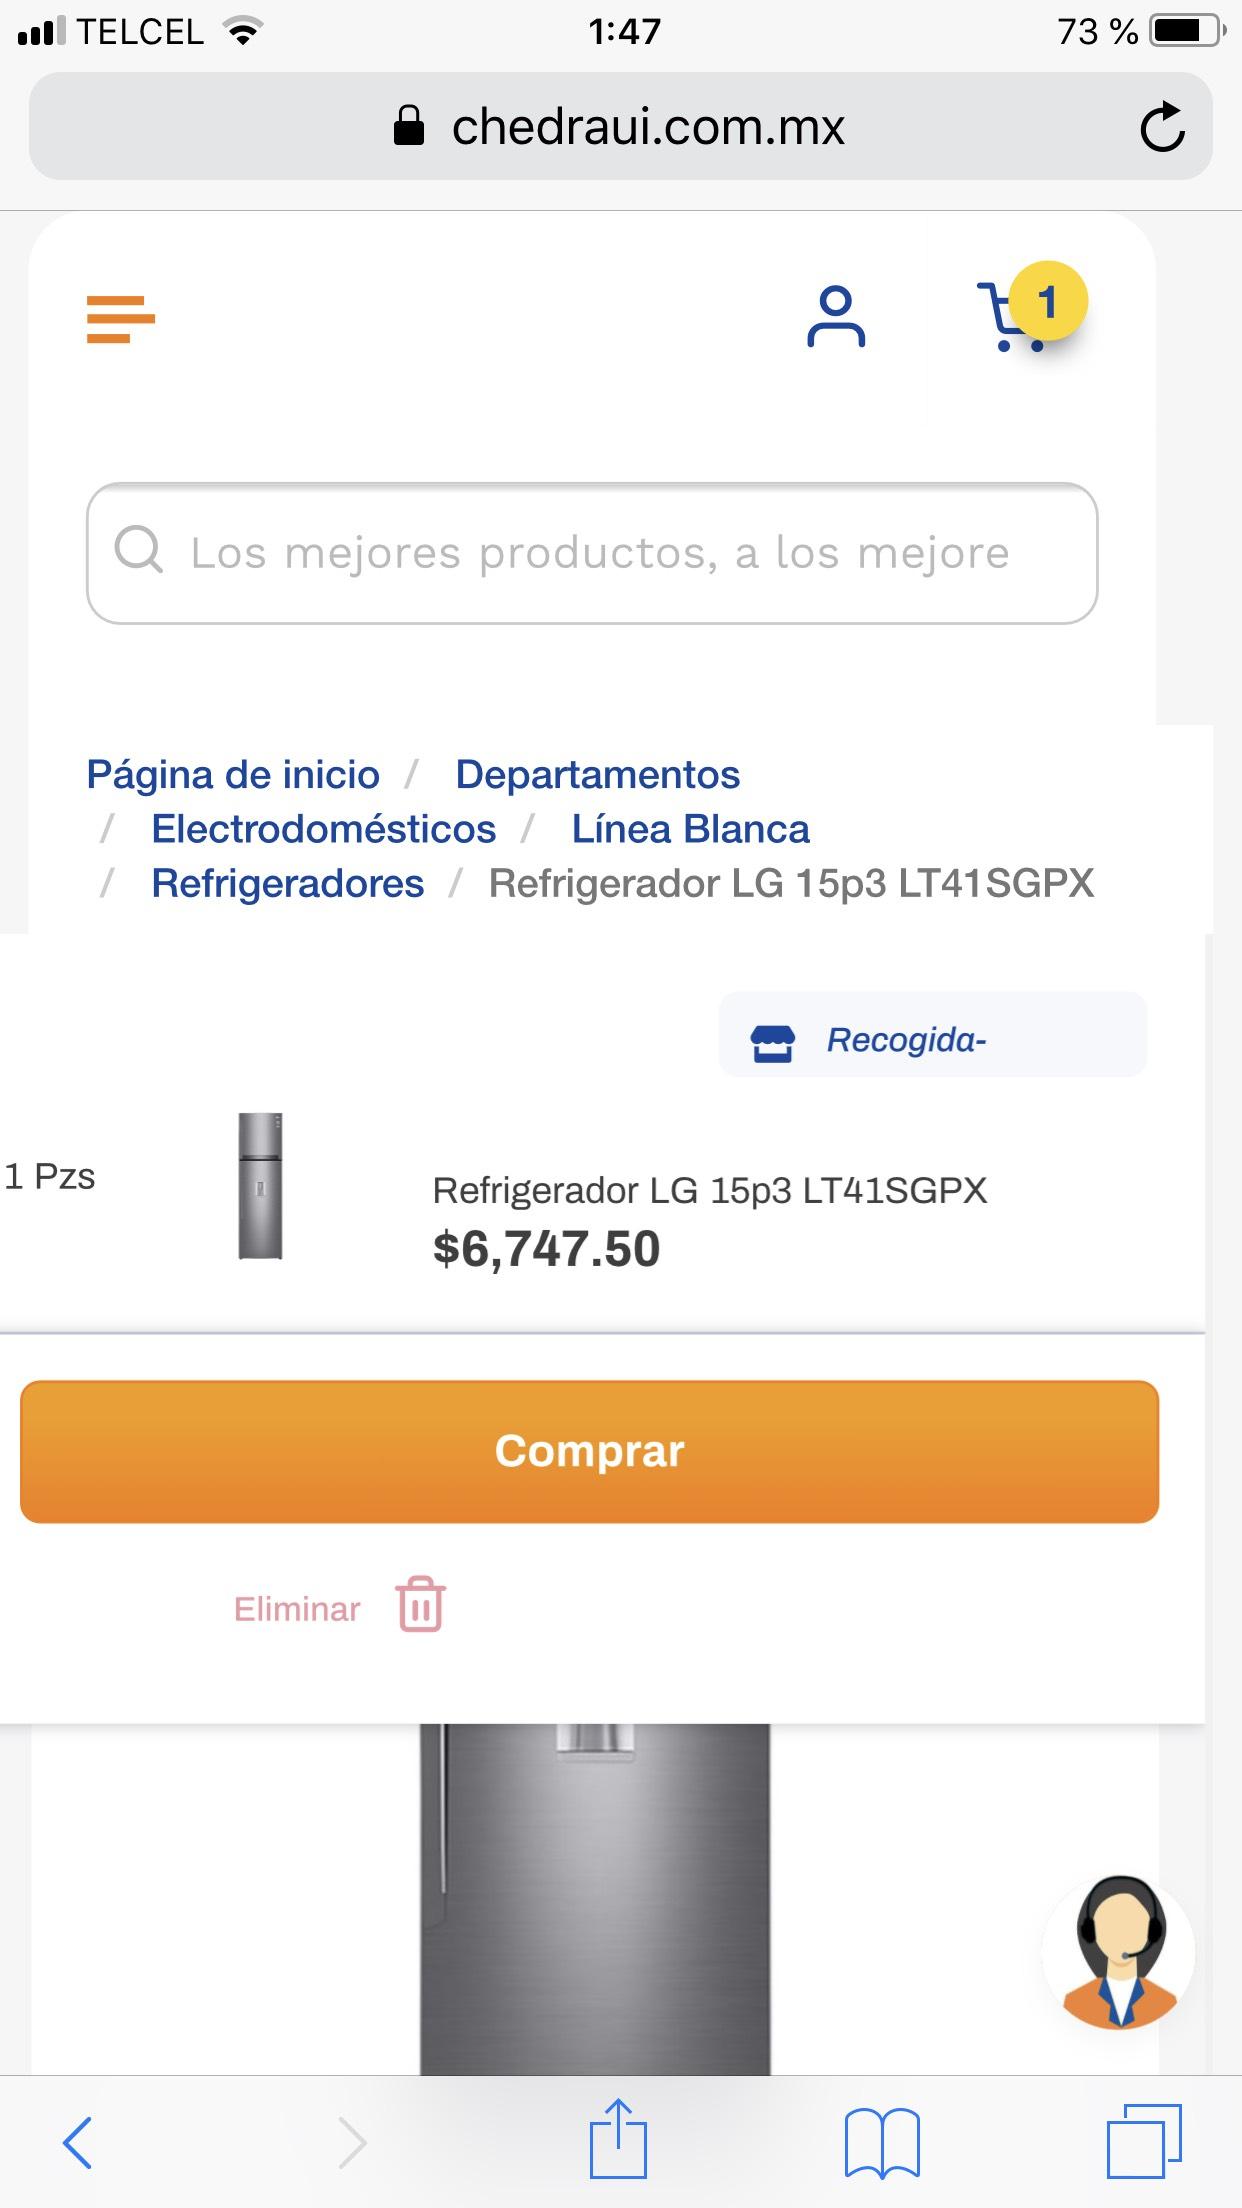 Chedraui: Refrigerador LG de 15 p3